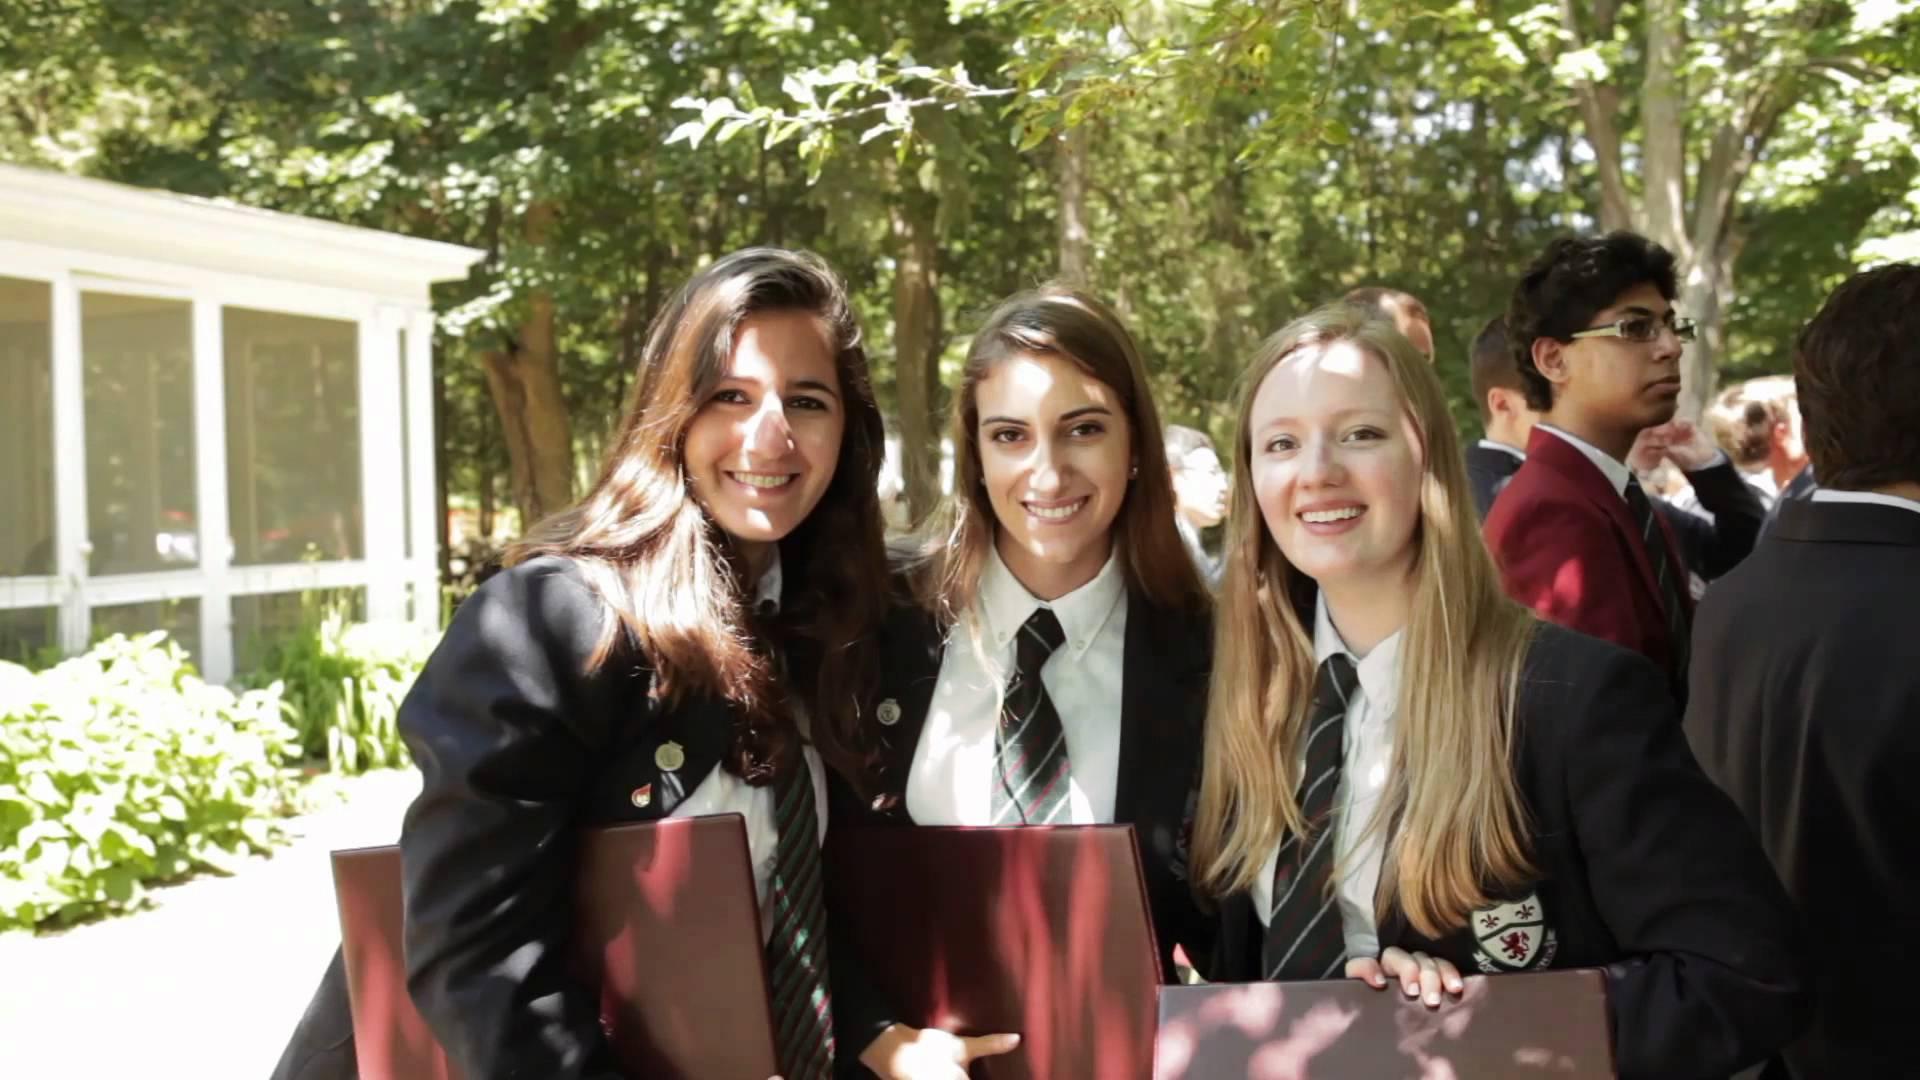 kanada-lise-egitimi-okullari-Ashbury-College-6 2.jpg